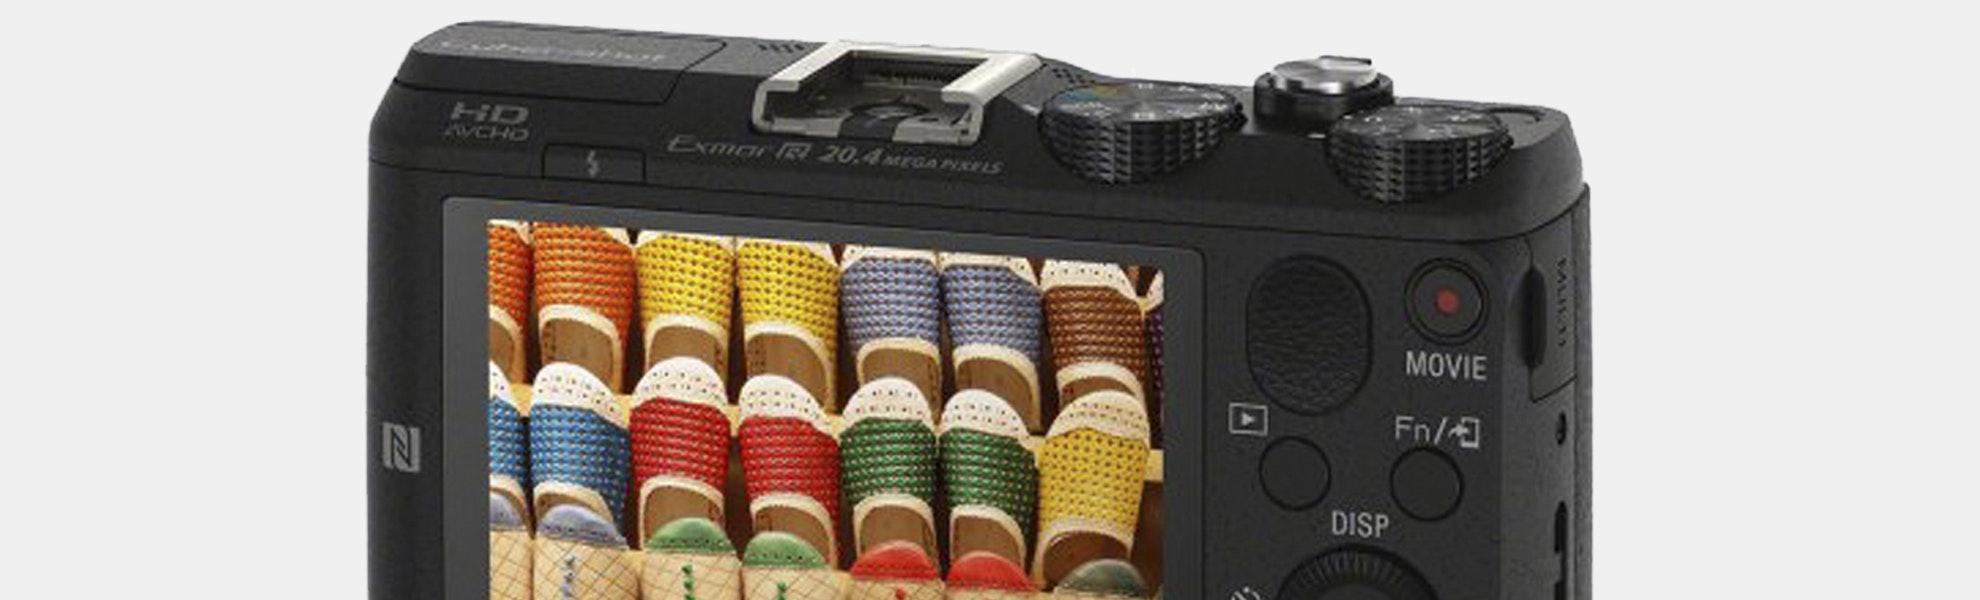 Sony HX60V 20.4MP Digital Camera w/GPS